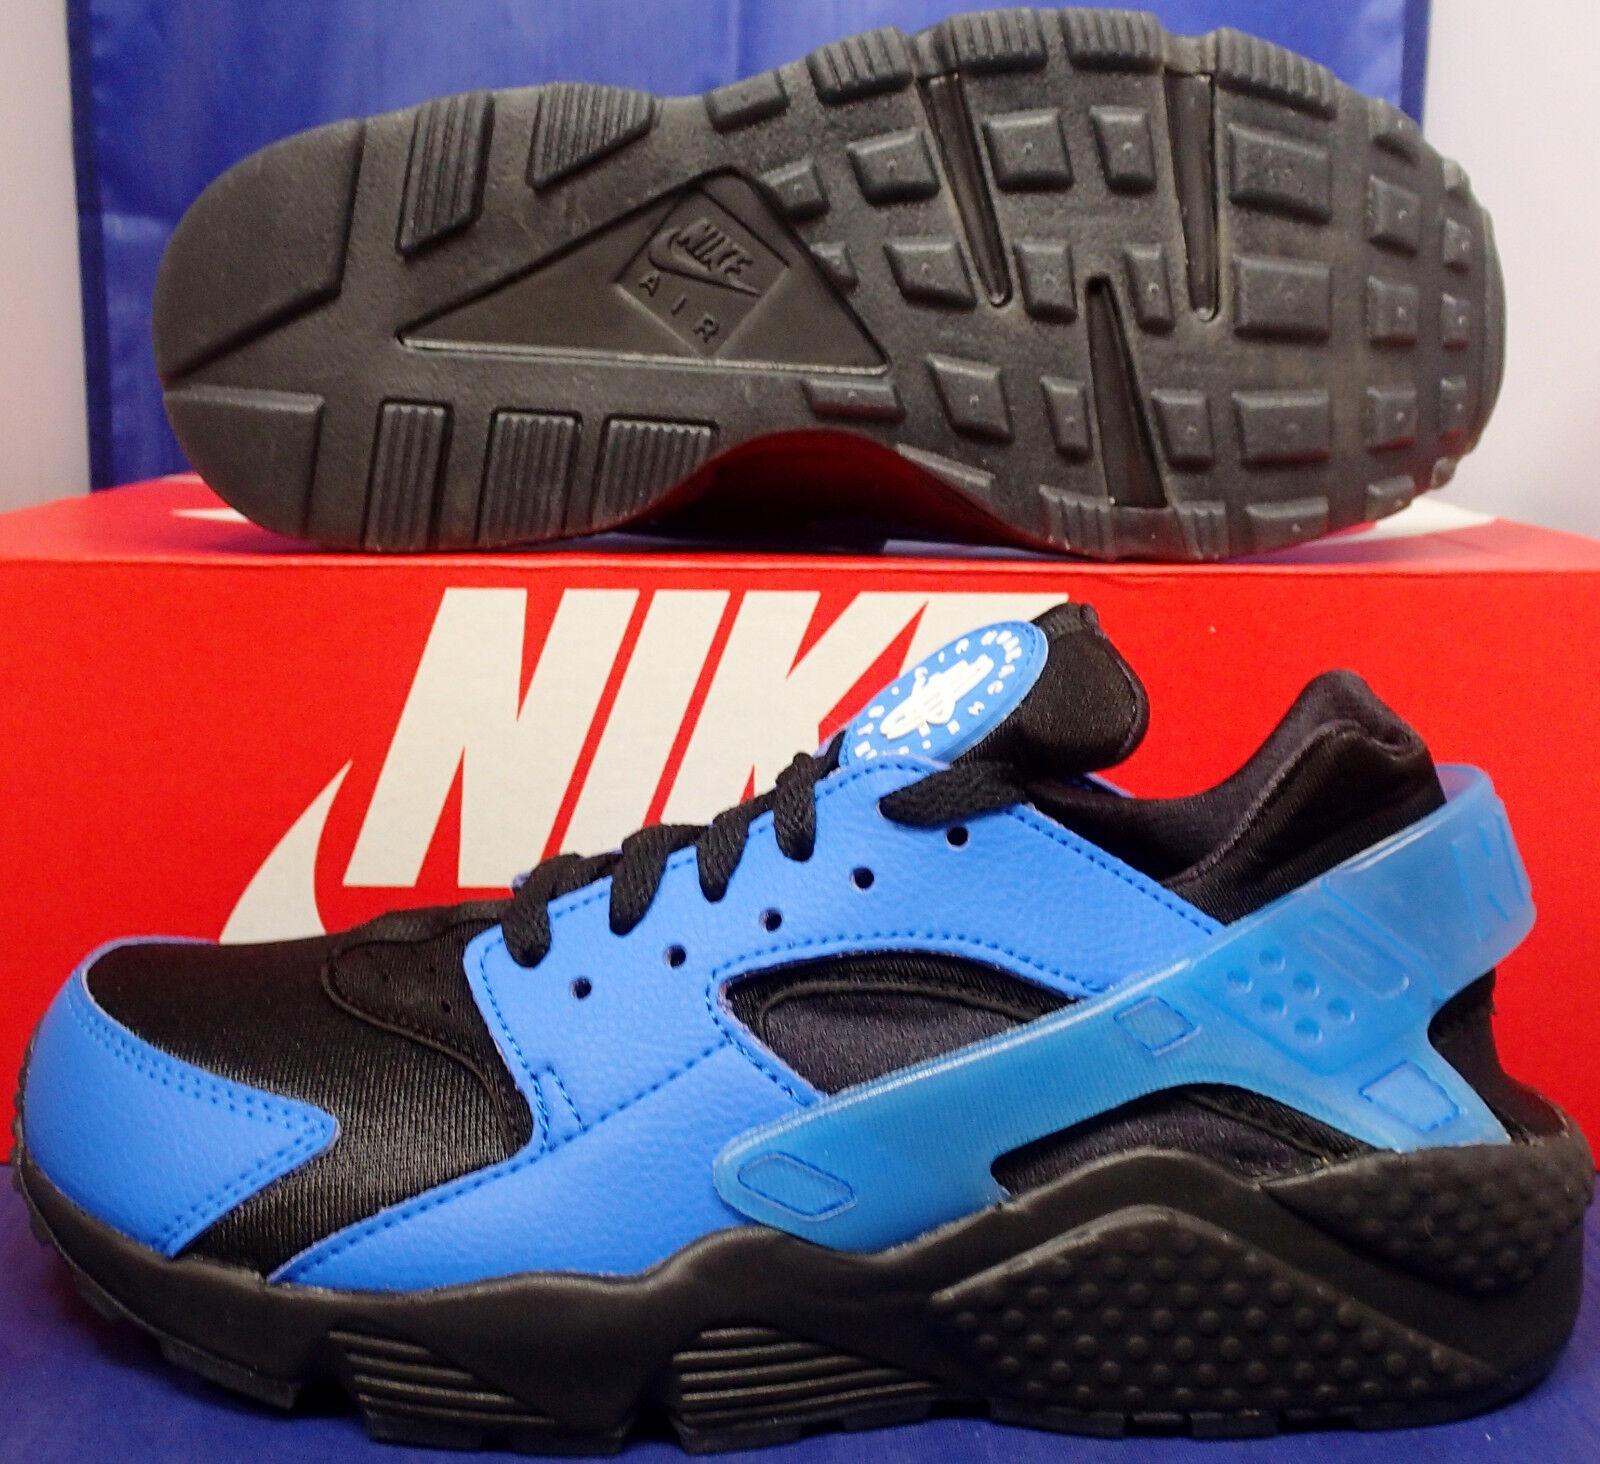 Nike Air Huarache Run ID ID ID Azul Negro Talla 6    para mujer Talla 7.5 (777330-994)  envío rápido en todo el mundo